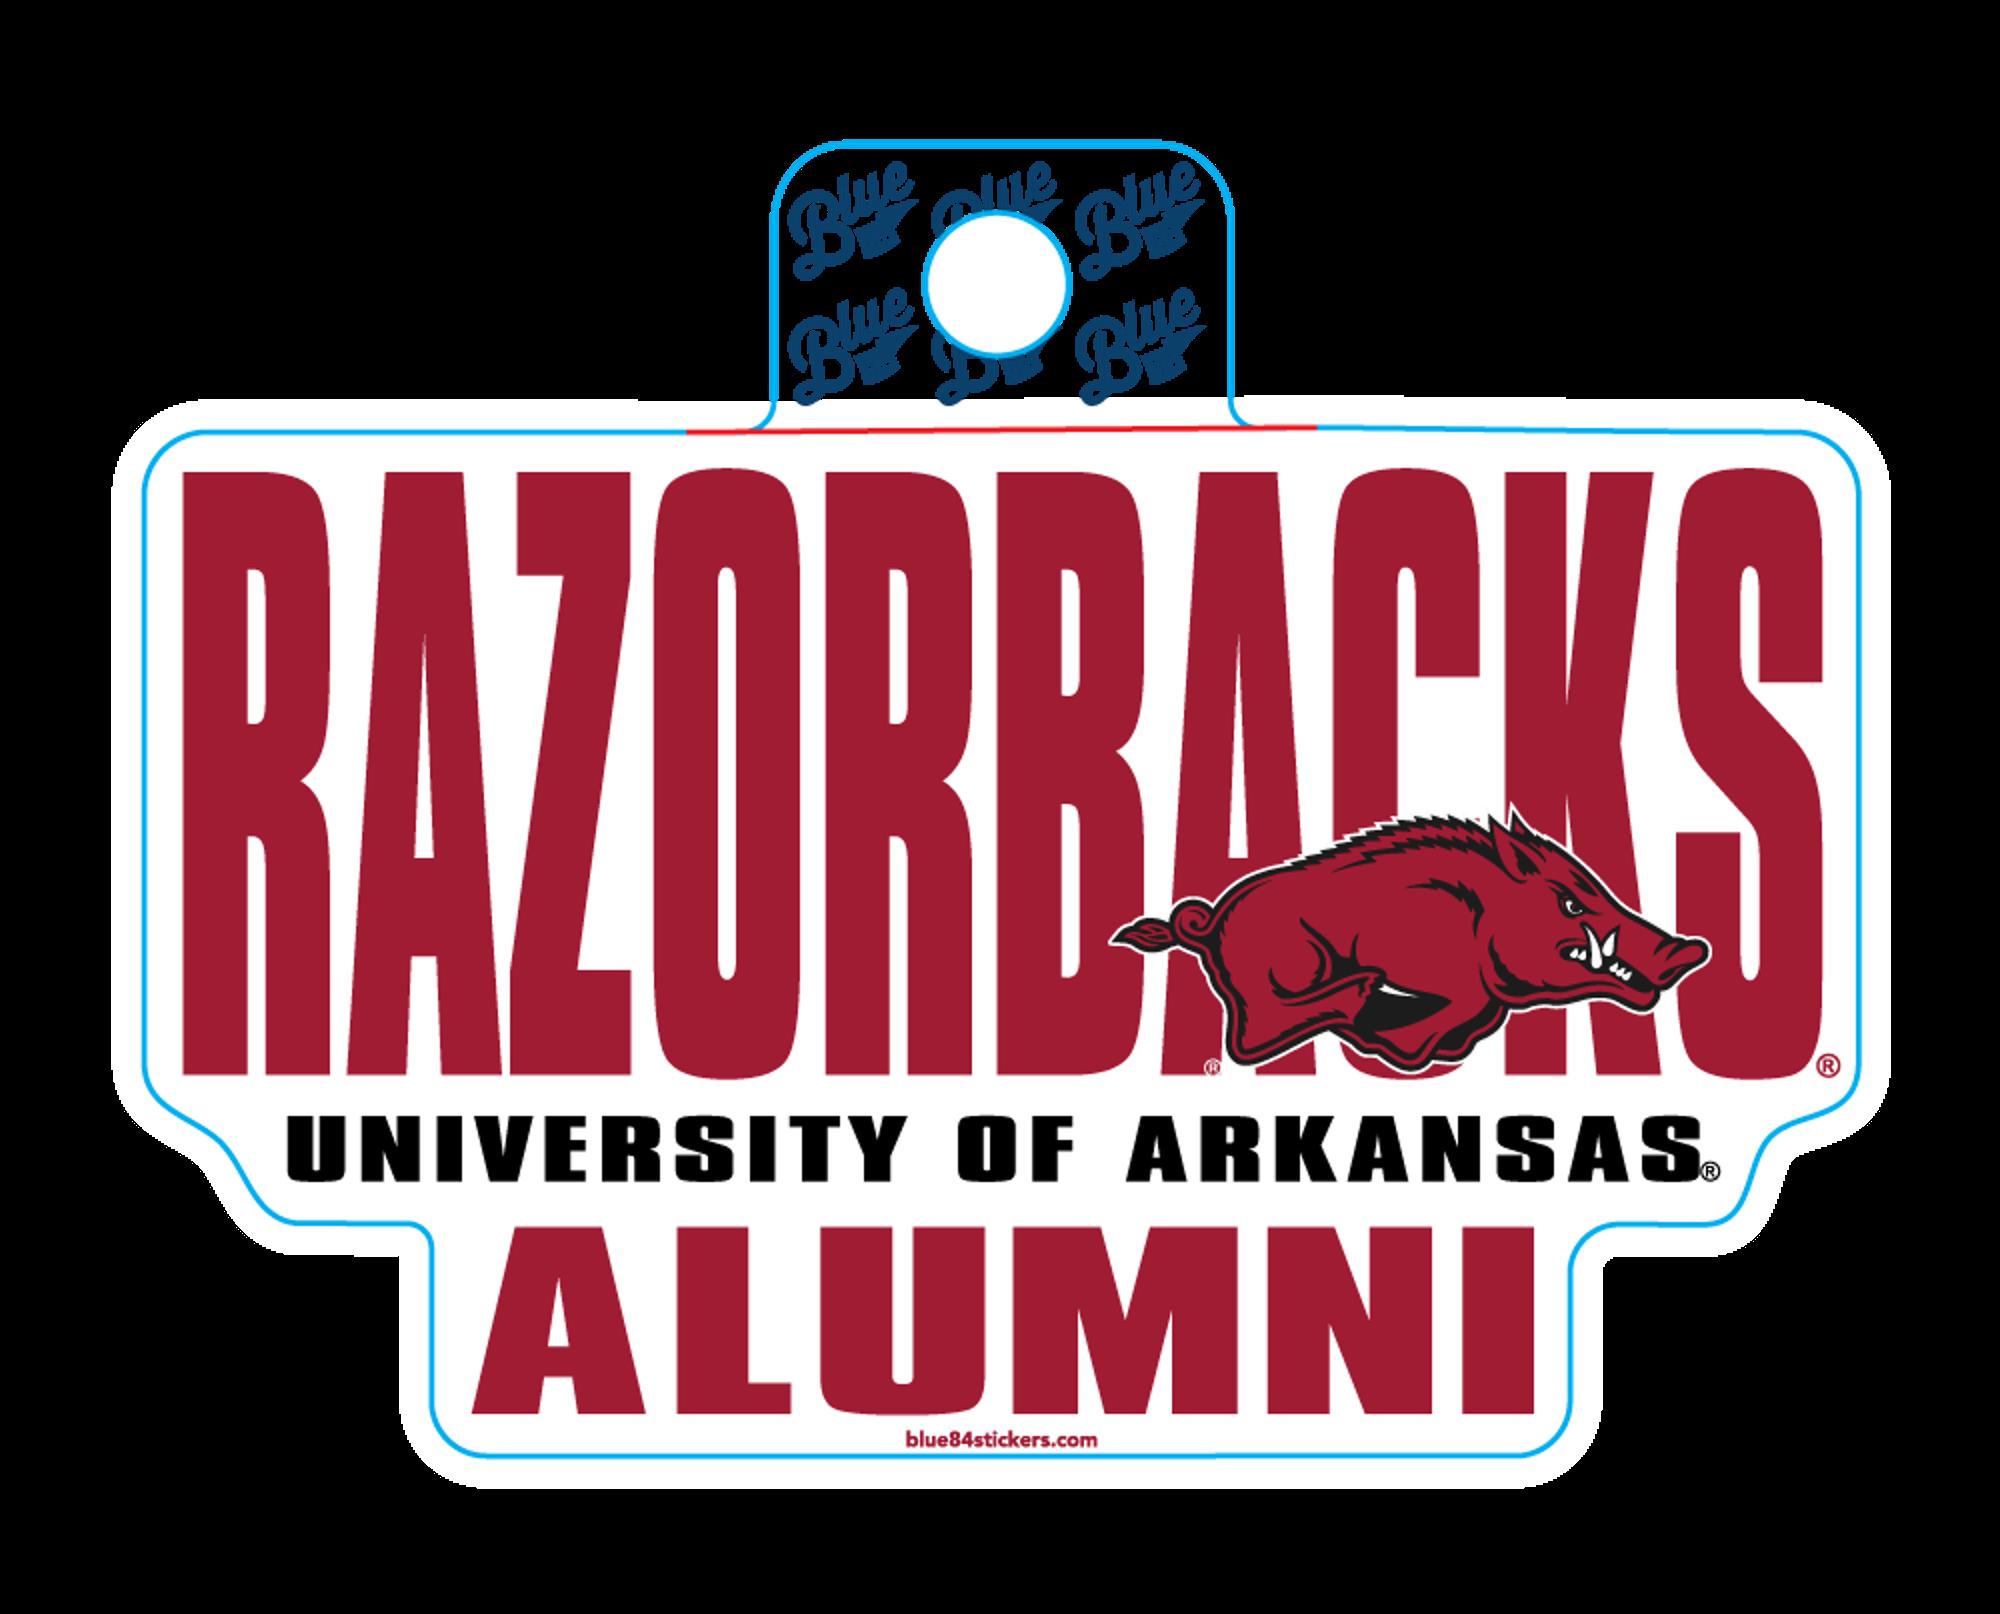 image of: Arkansas Razorbacks Blue 84 University of Arkansas Alumni Sticker